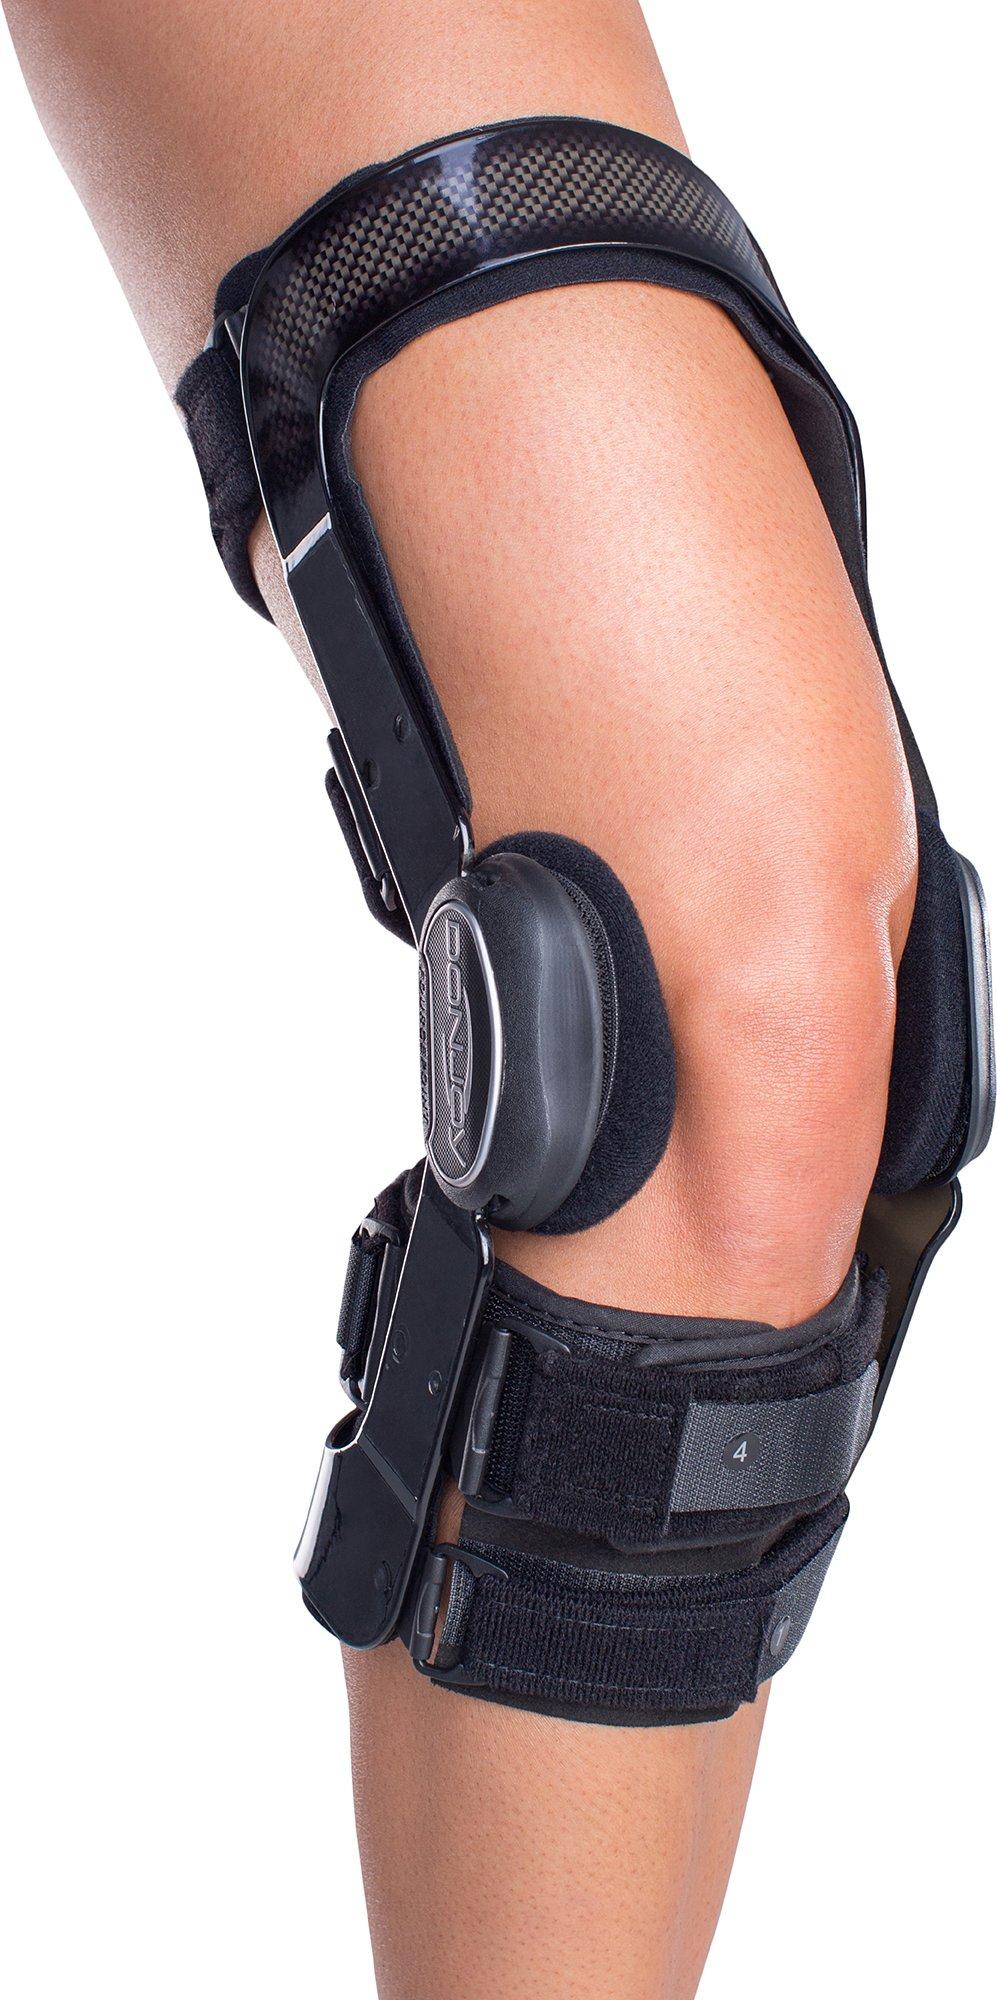 DonJoy FullForce Knee Support Brace: Short Calf Length, ACL (Anterior Cruciate Ligament), Left Leg, Medium